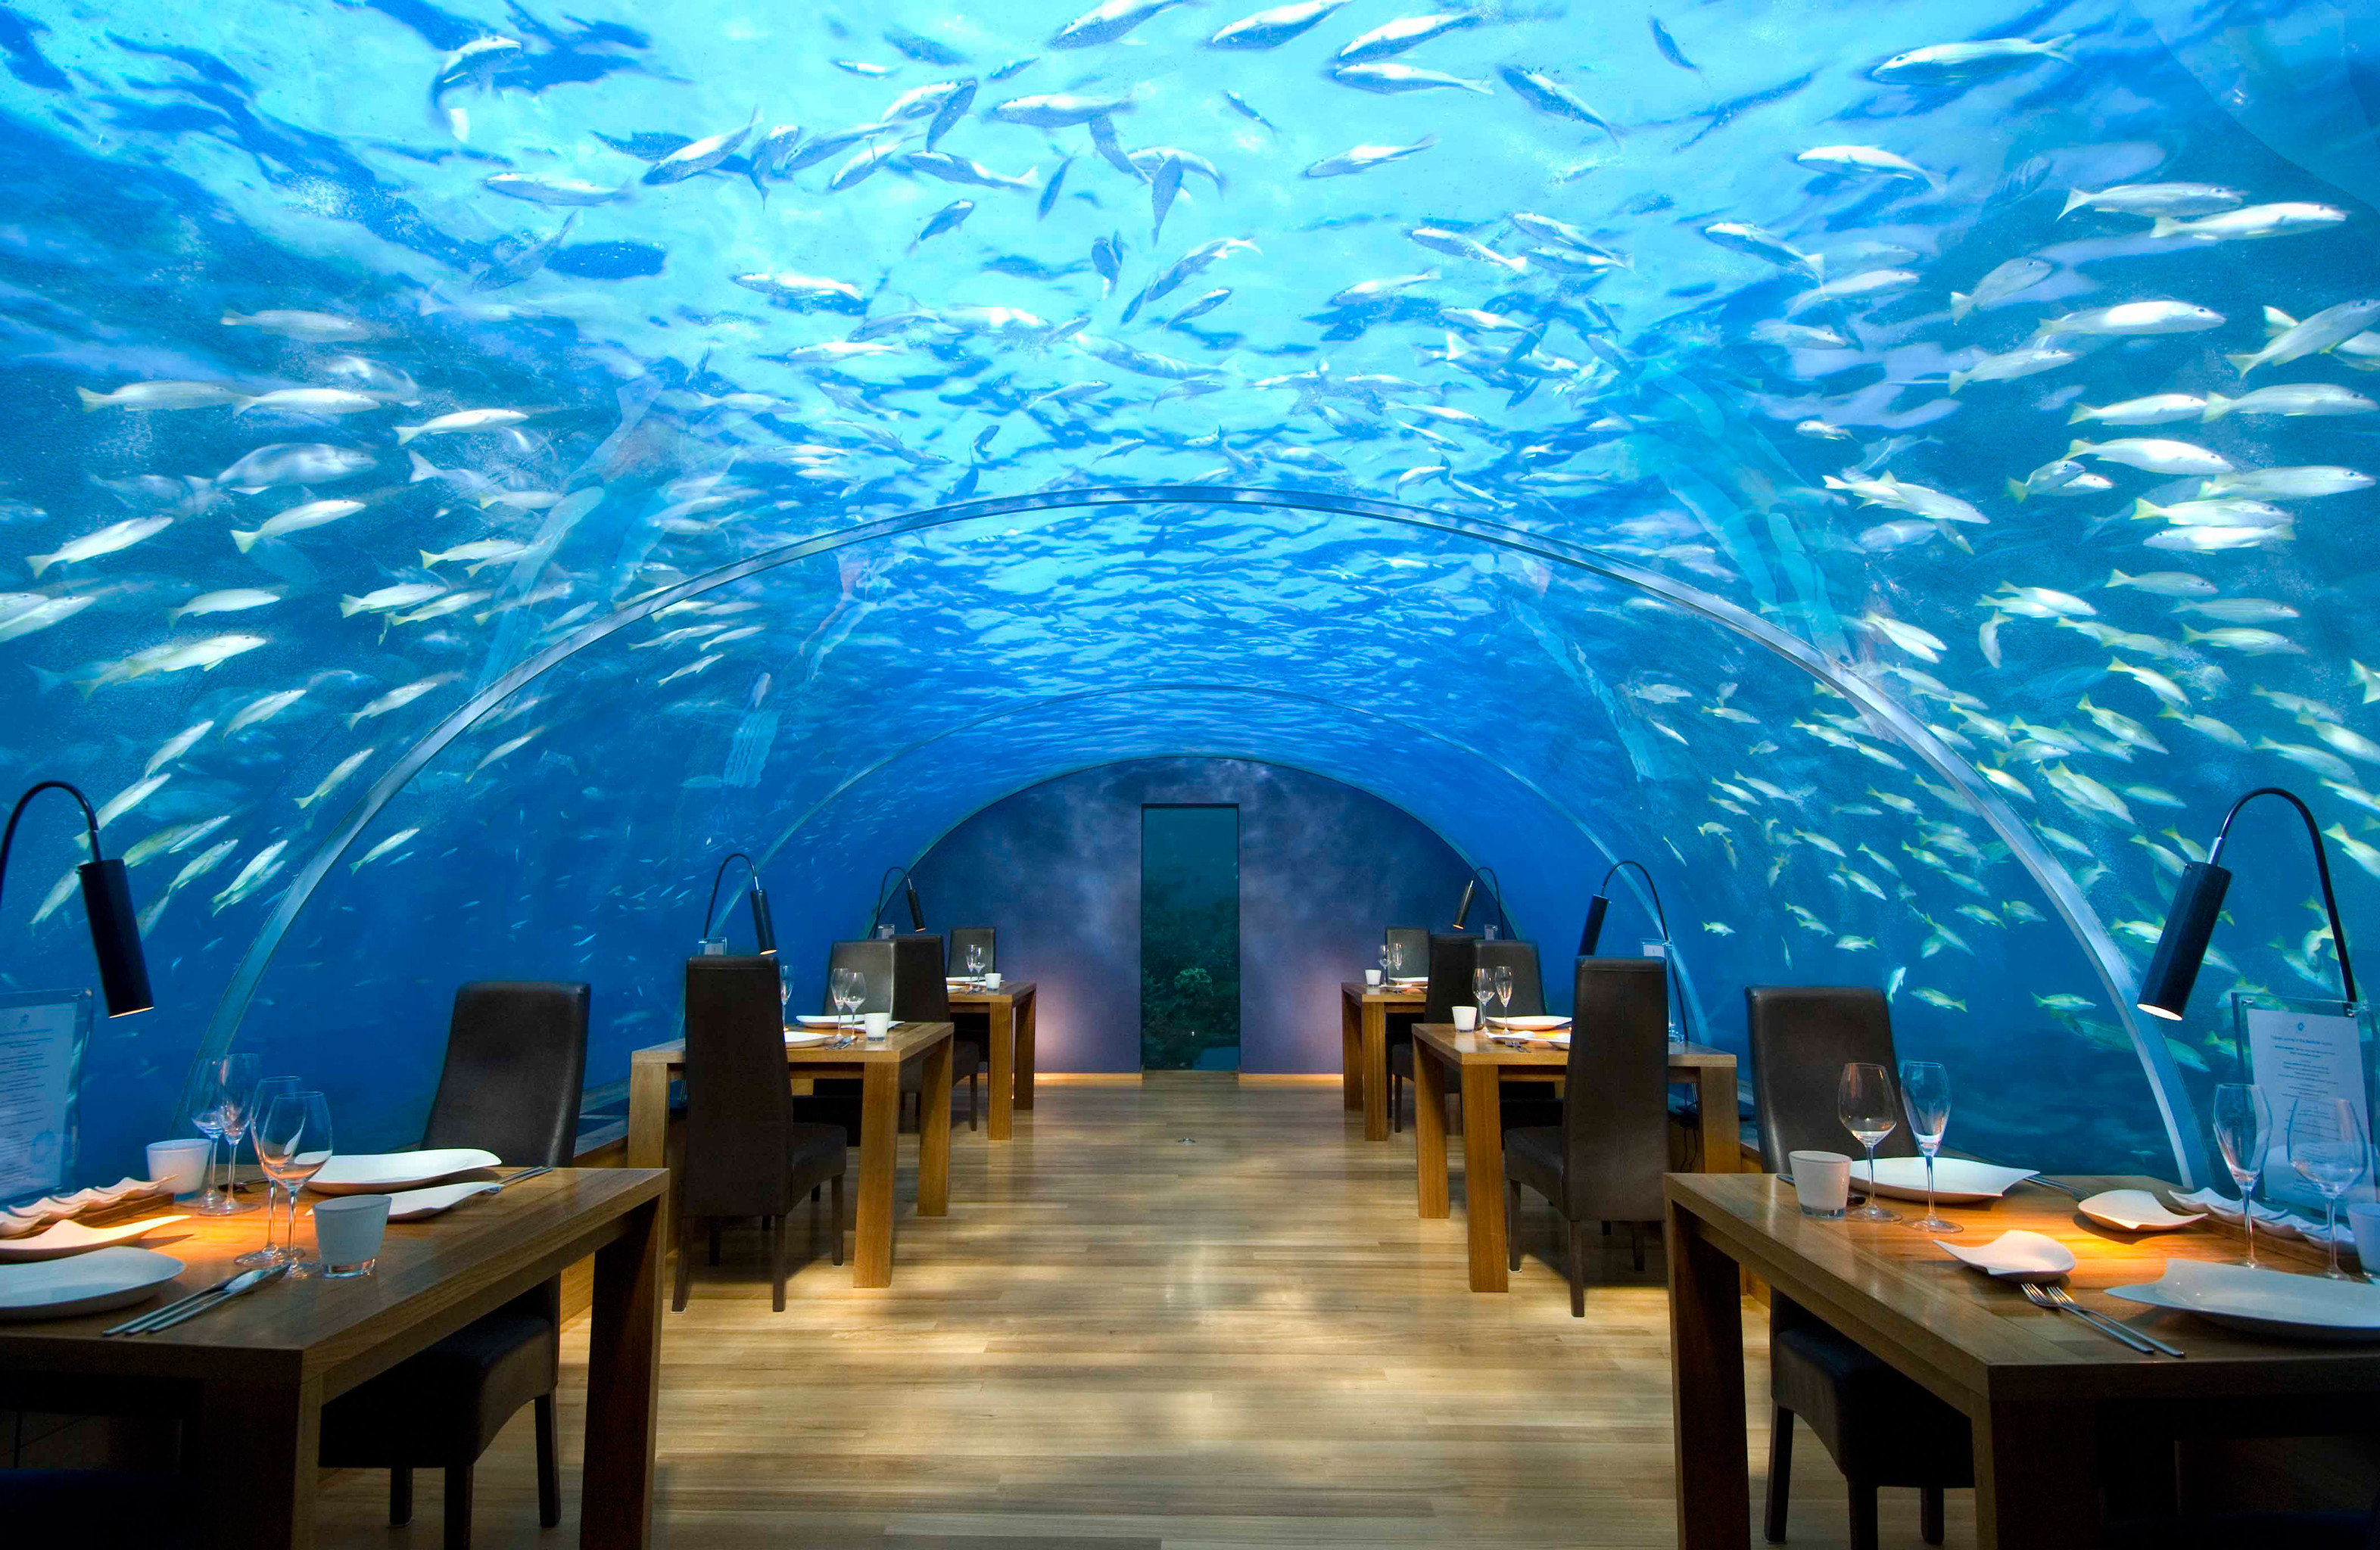 Bar Dining Drink Eat Elegant Entertainment Hotels Natural wonders Ocean Scenic views Wildlife table chair screenshot theatre